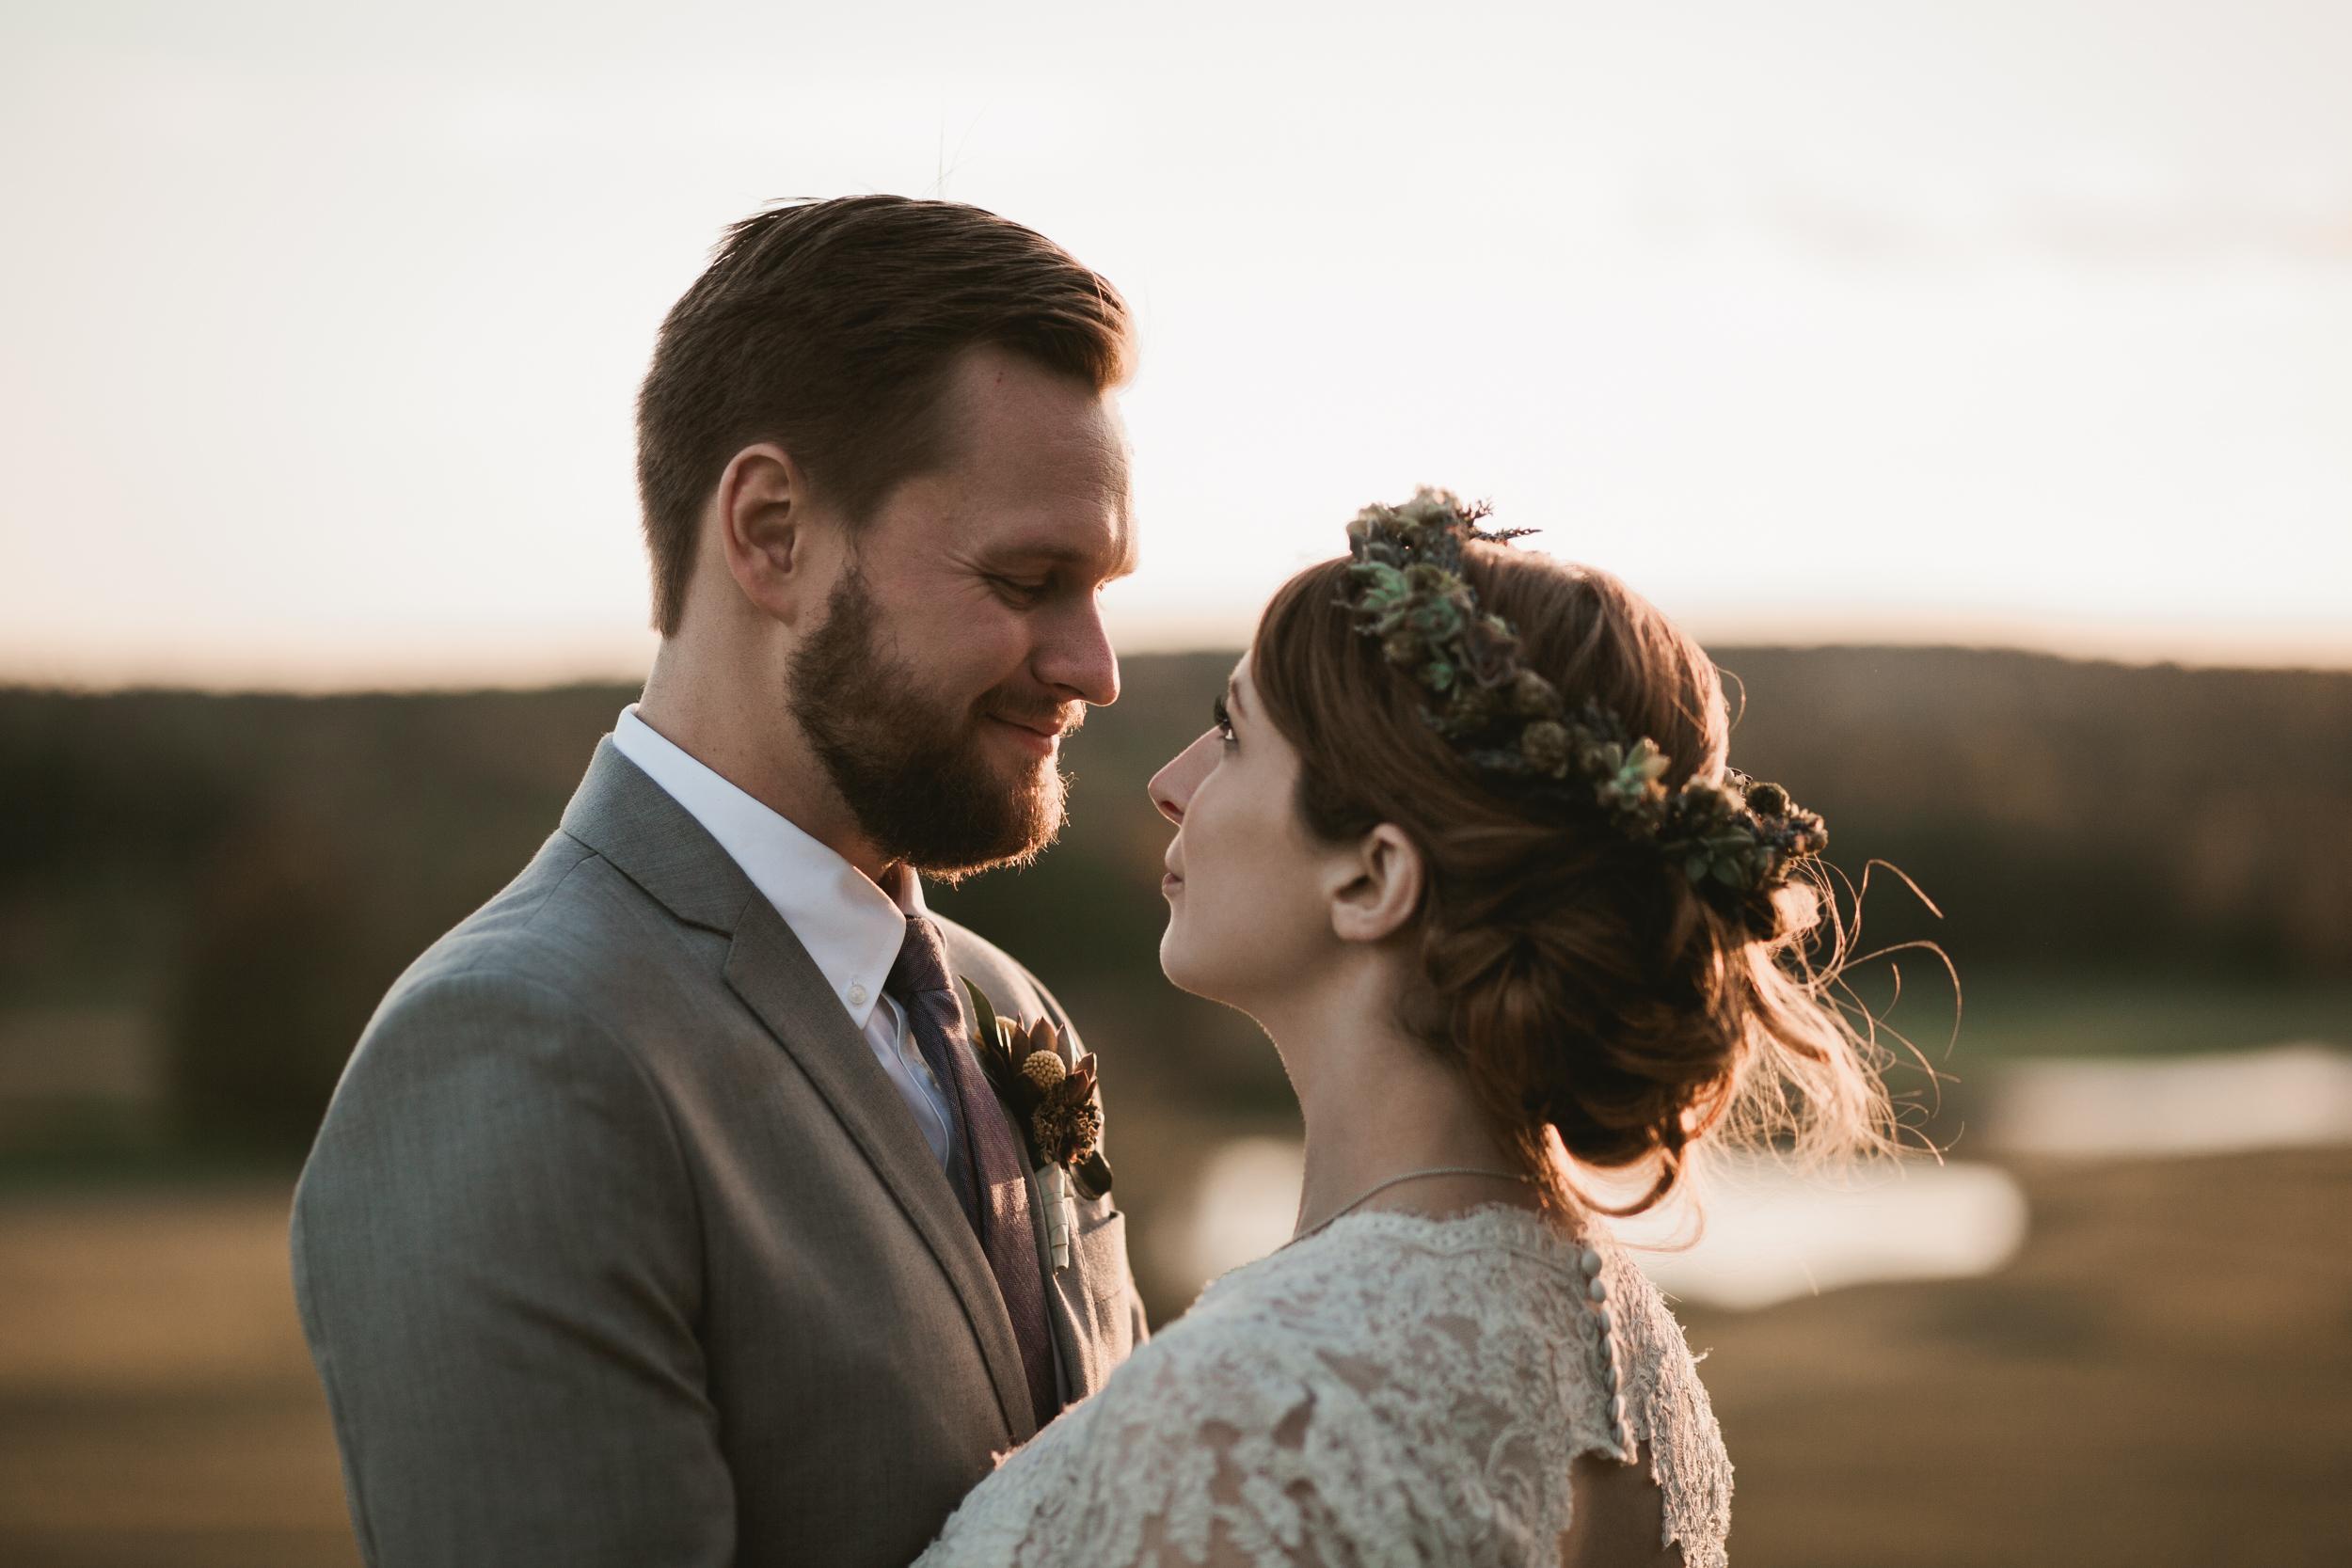 Spring-Meadows-Maine-Wedding-185.jpg